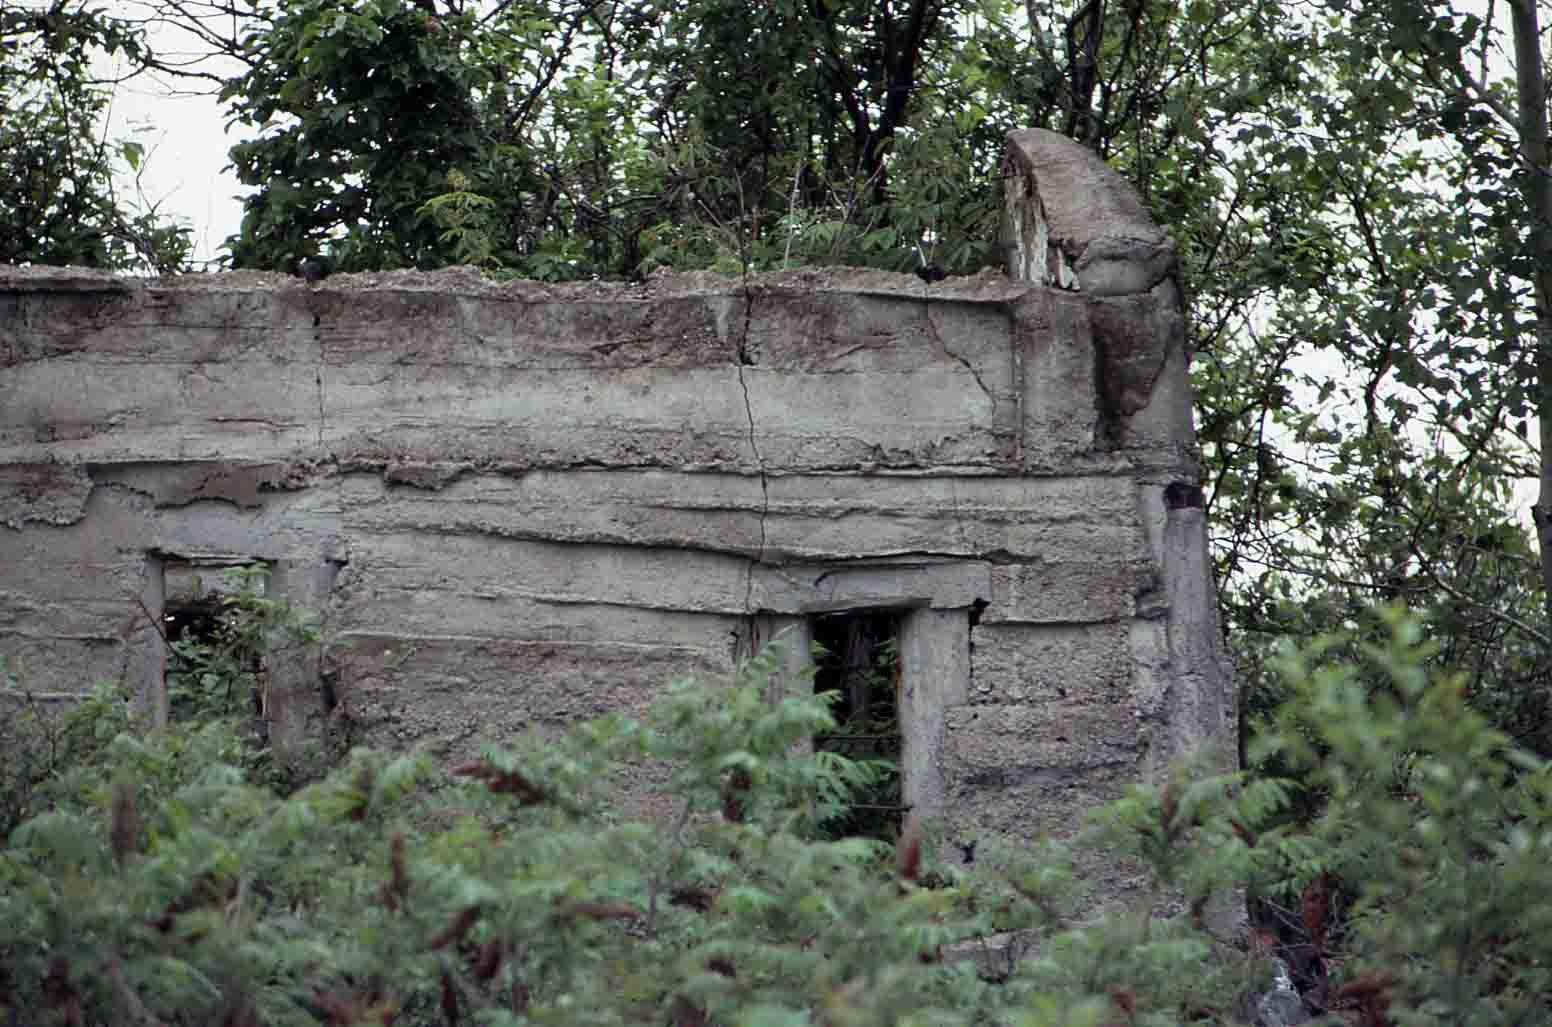 Building ruins, location unknown